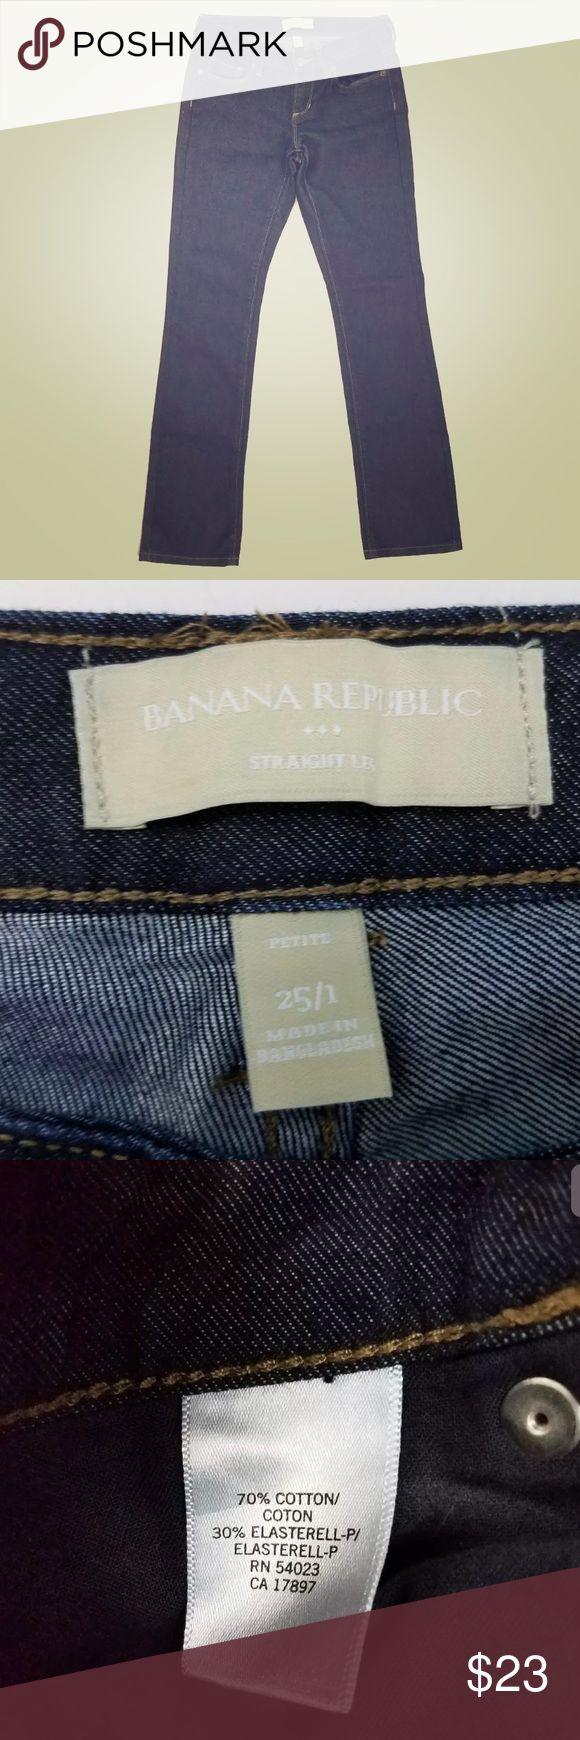 Banana Republic women's straight leg petite jeans Banana Republic women's straight leg petite jeans size 25/1 dark wash  waist: 14 inches rise: 7 inches inseam: 29 waist: 14  70% cotton 30% elastane no holes or stains great condition Banana Republic Jeans Straight Leg